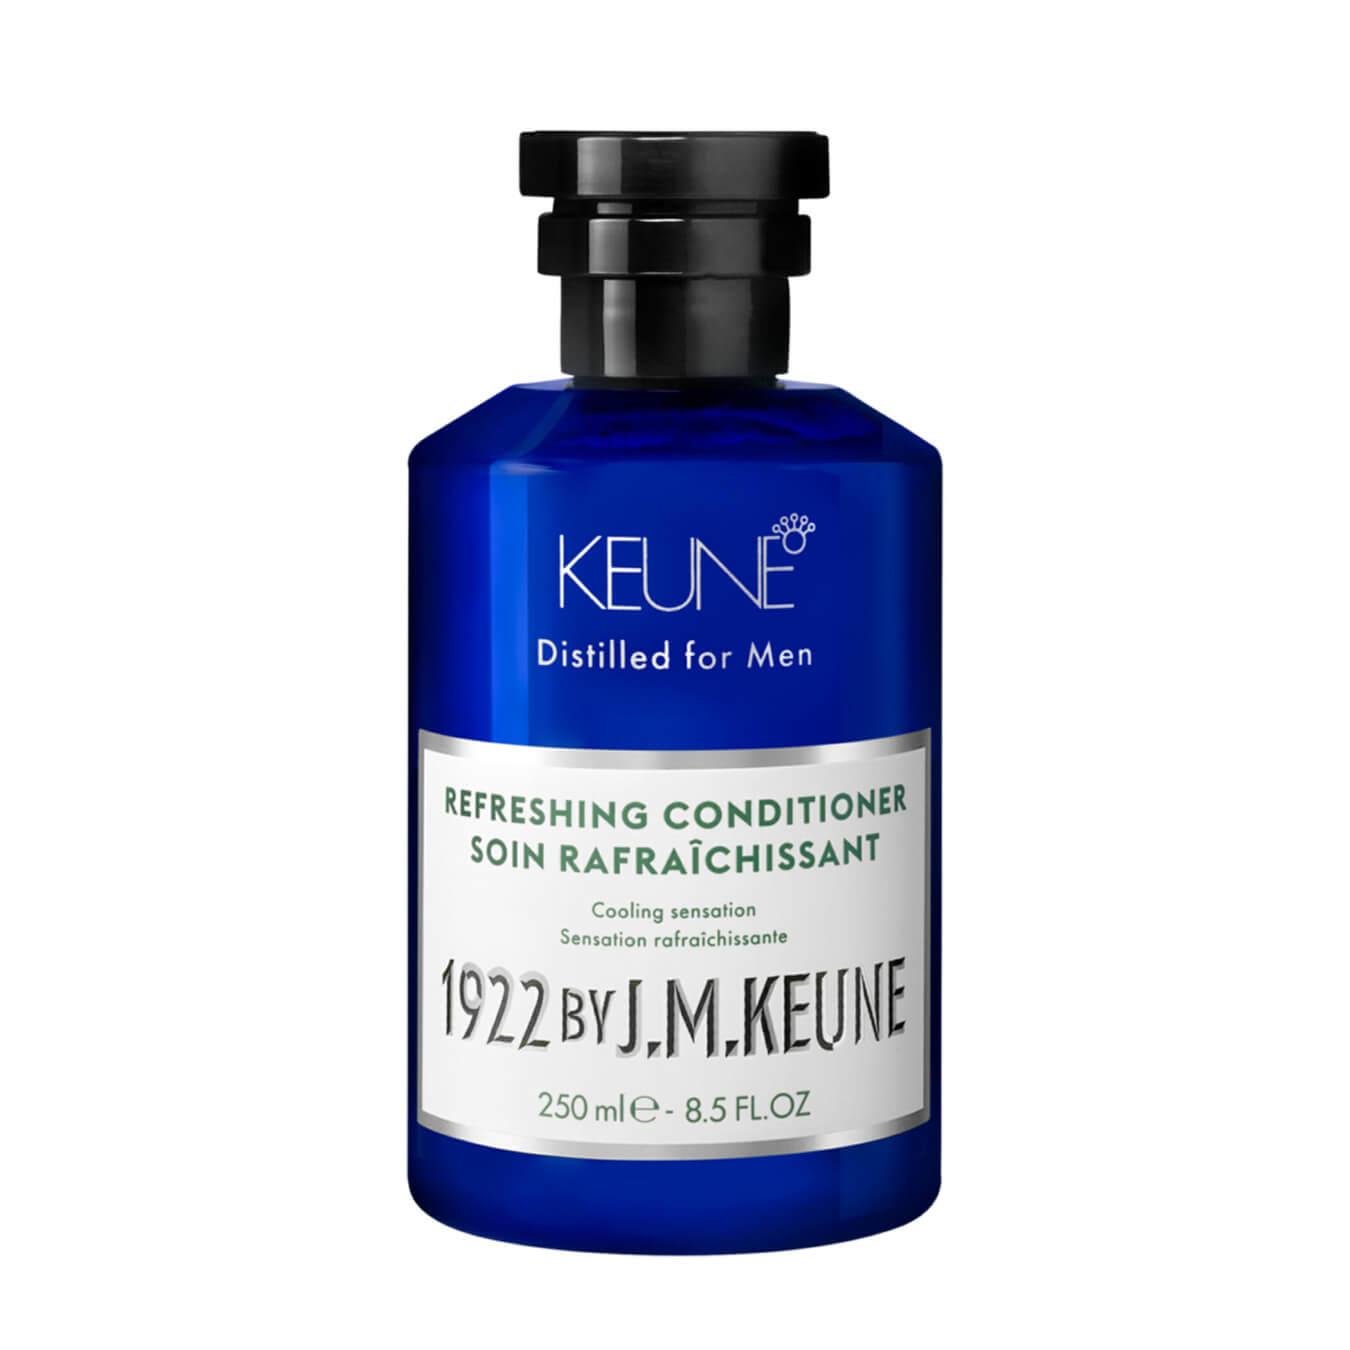 Kauf 1922 By JM Keune Refreshing Conditioner 250ml